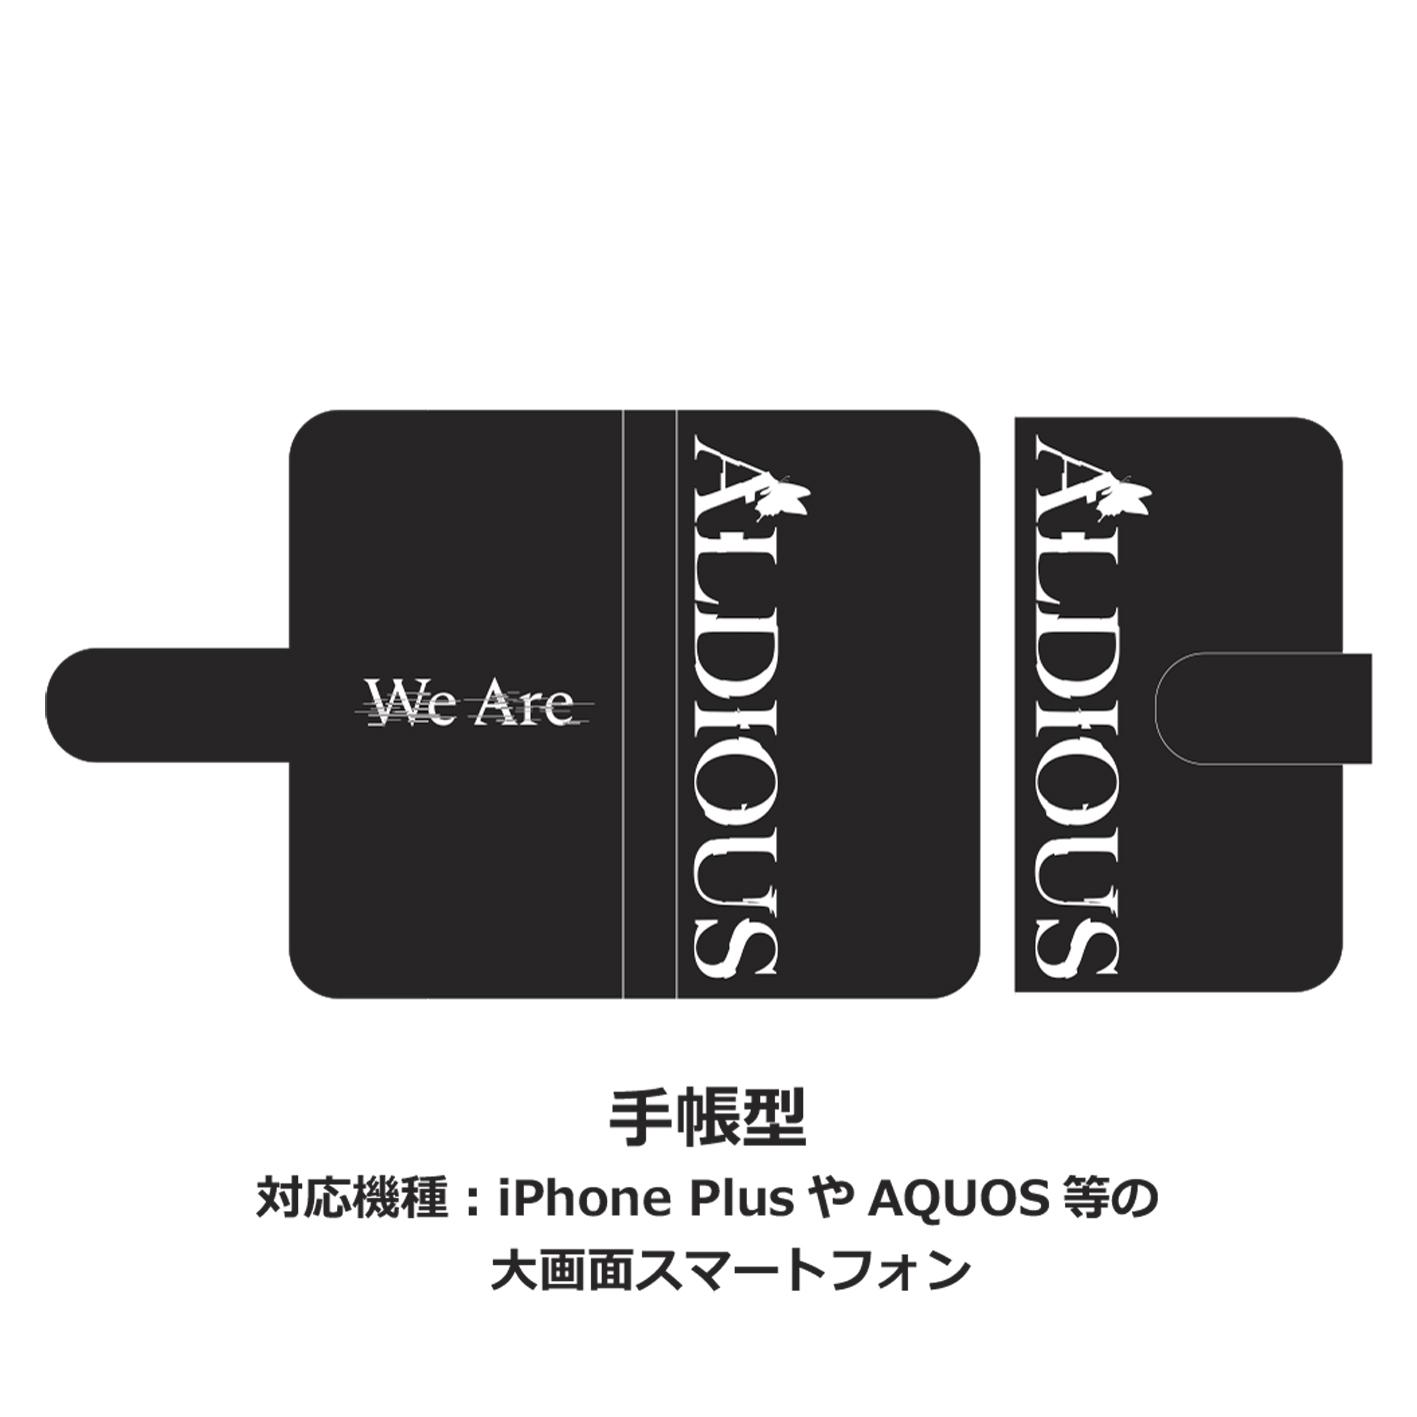 Aldious 手帳型スマホケース「We Are」